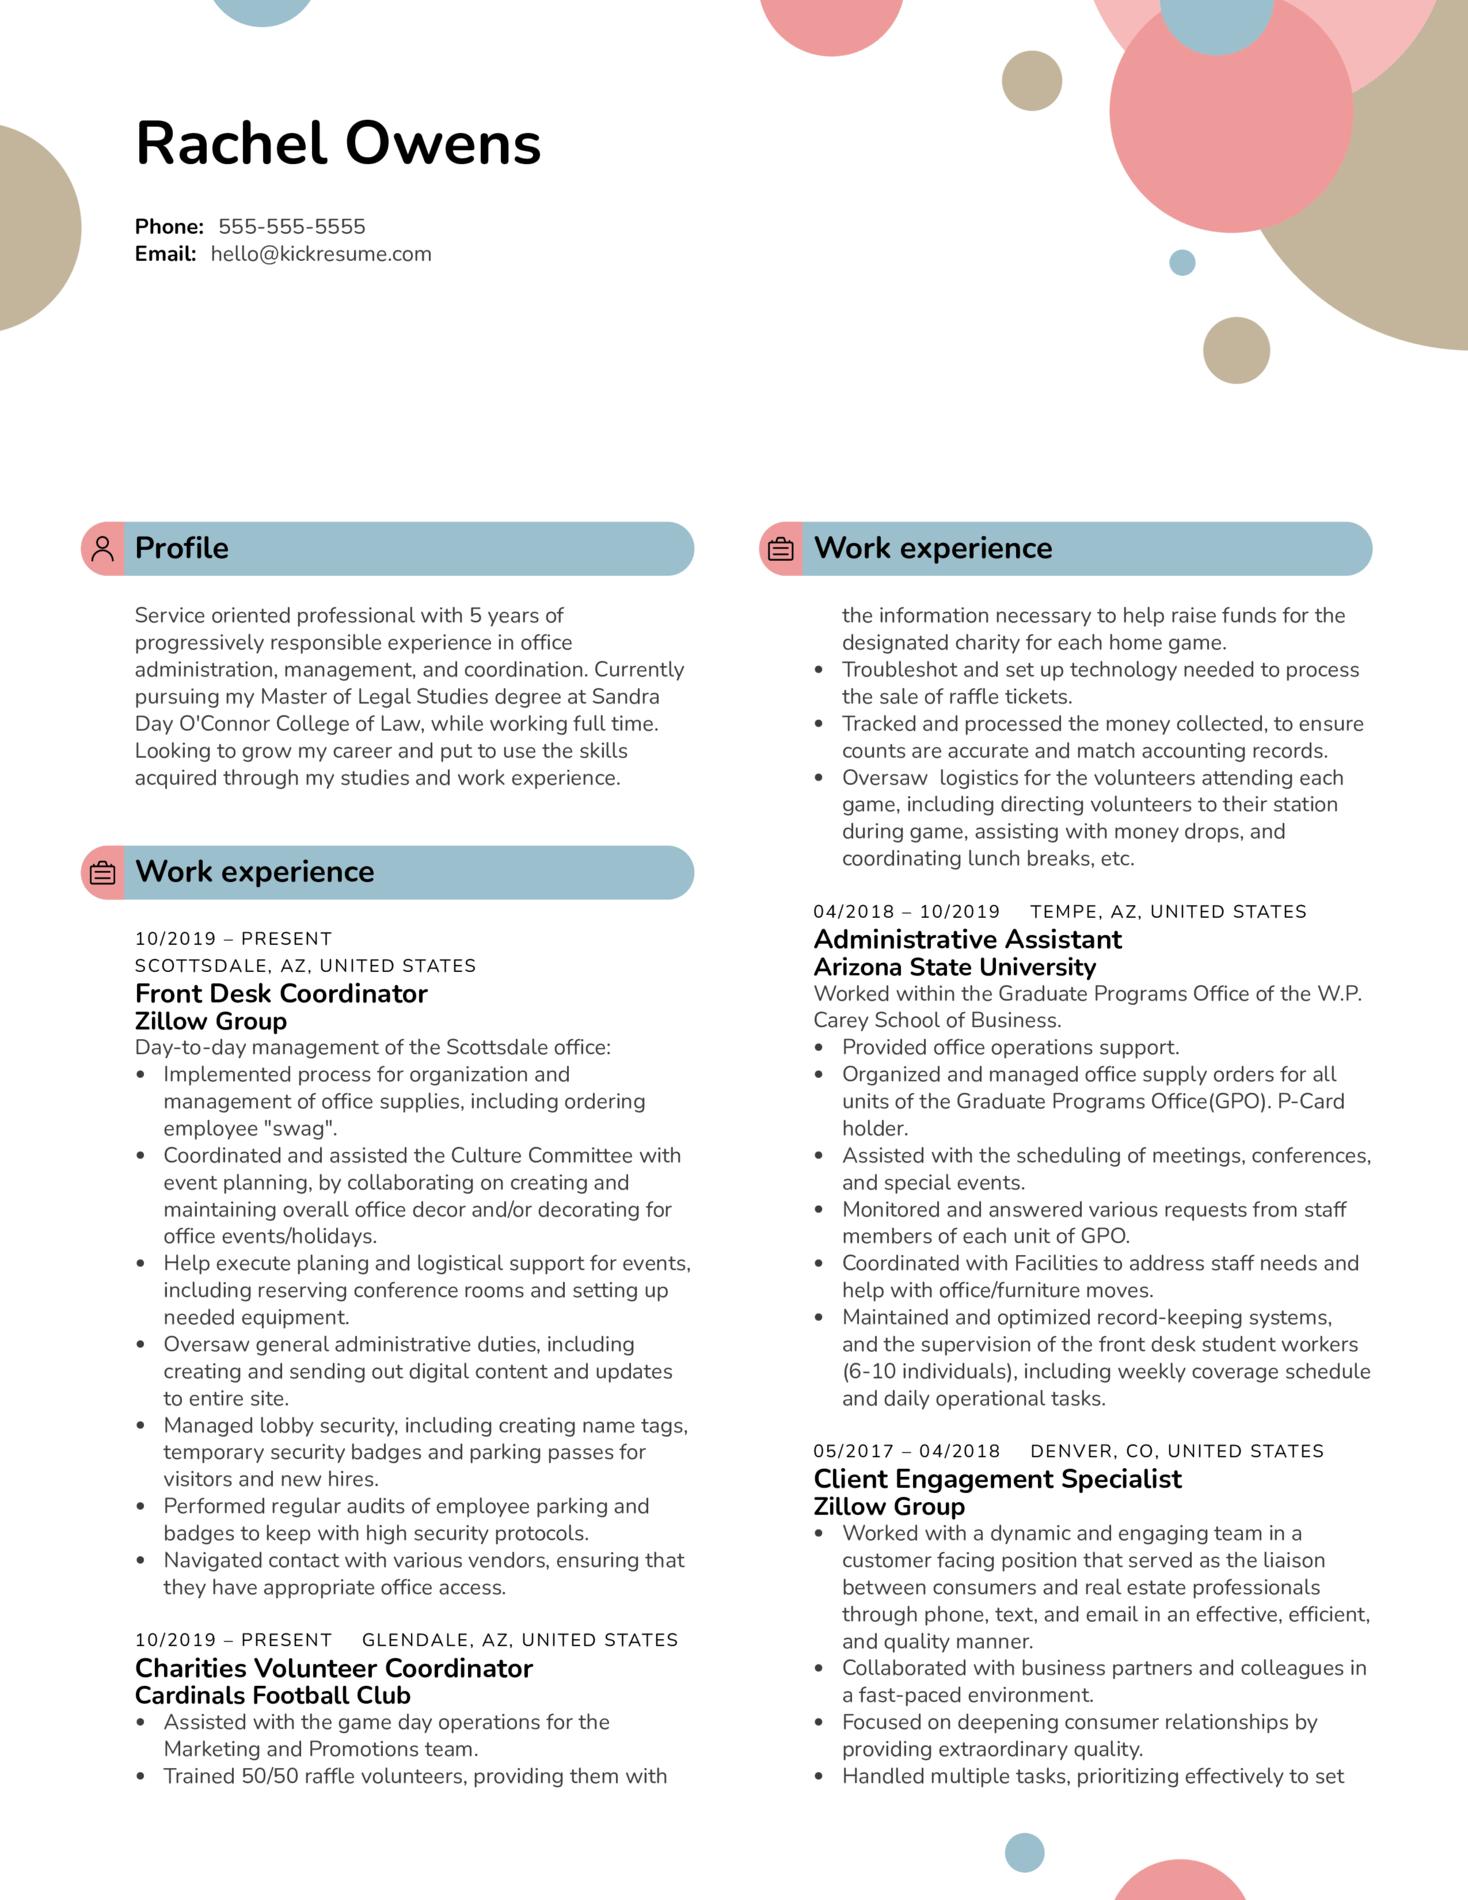 Front Desk Coordinator at Zillow Group Resume Sample (Parte 1)